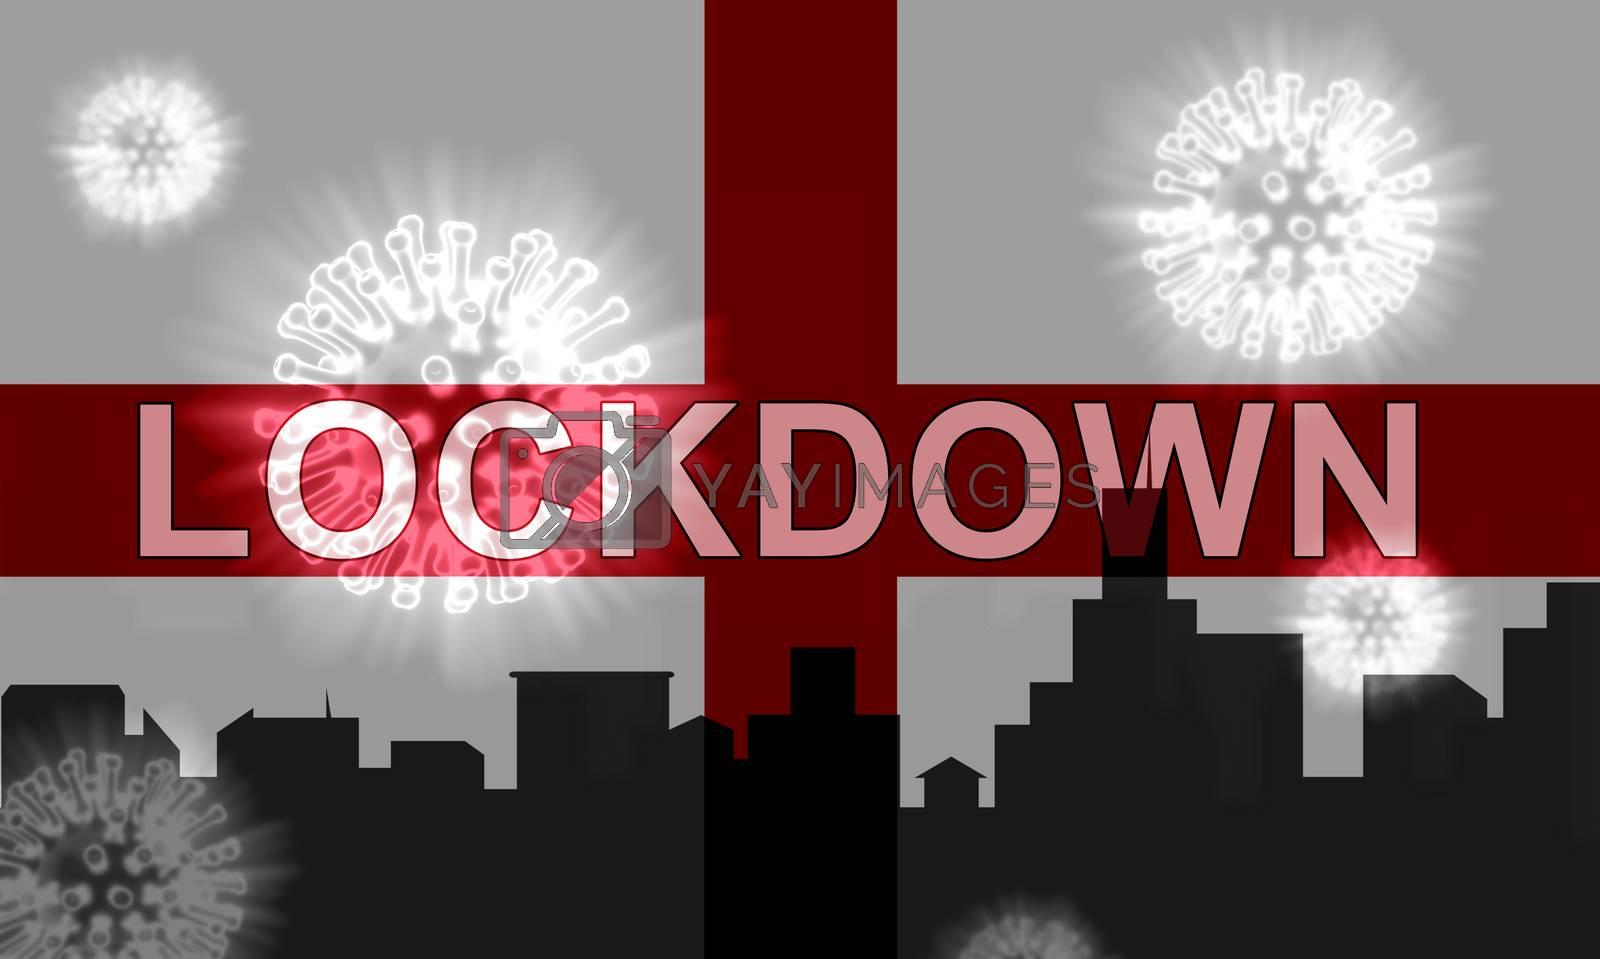 England lockdown confinement preventing coronavirus spread or outbreak. Covid 19 English precaution to lock down virus infection - 3d Illustration